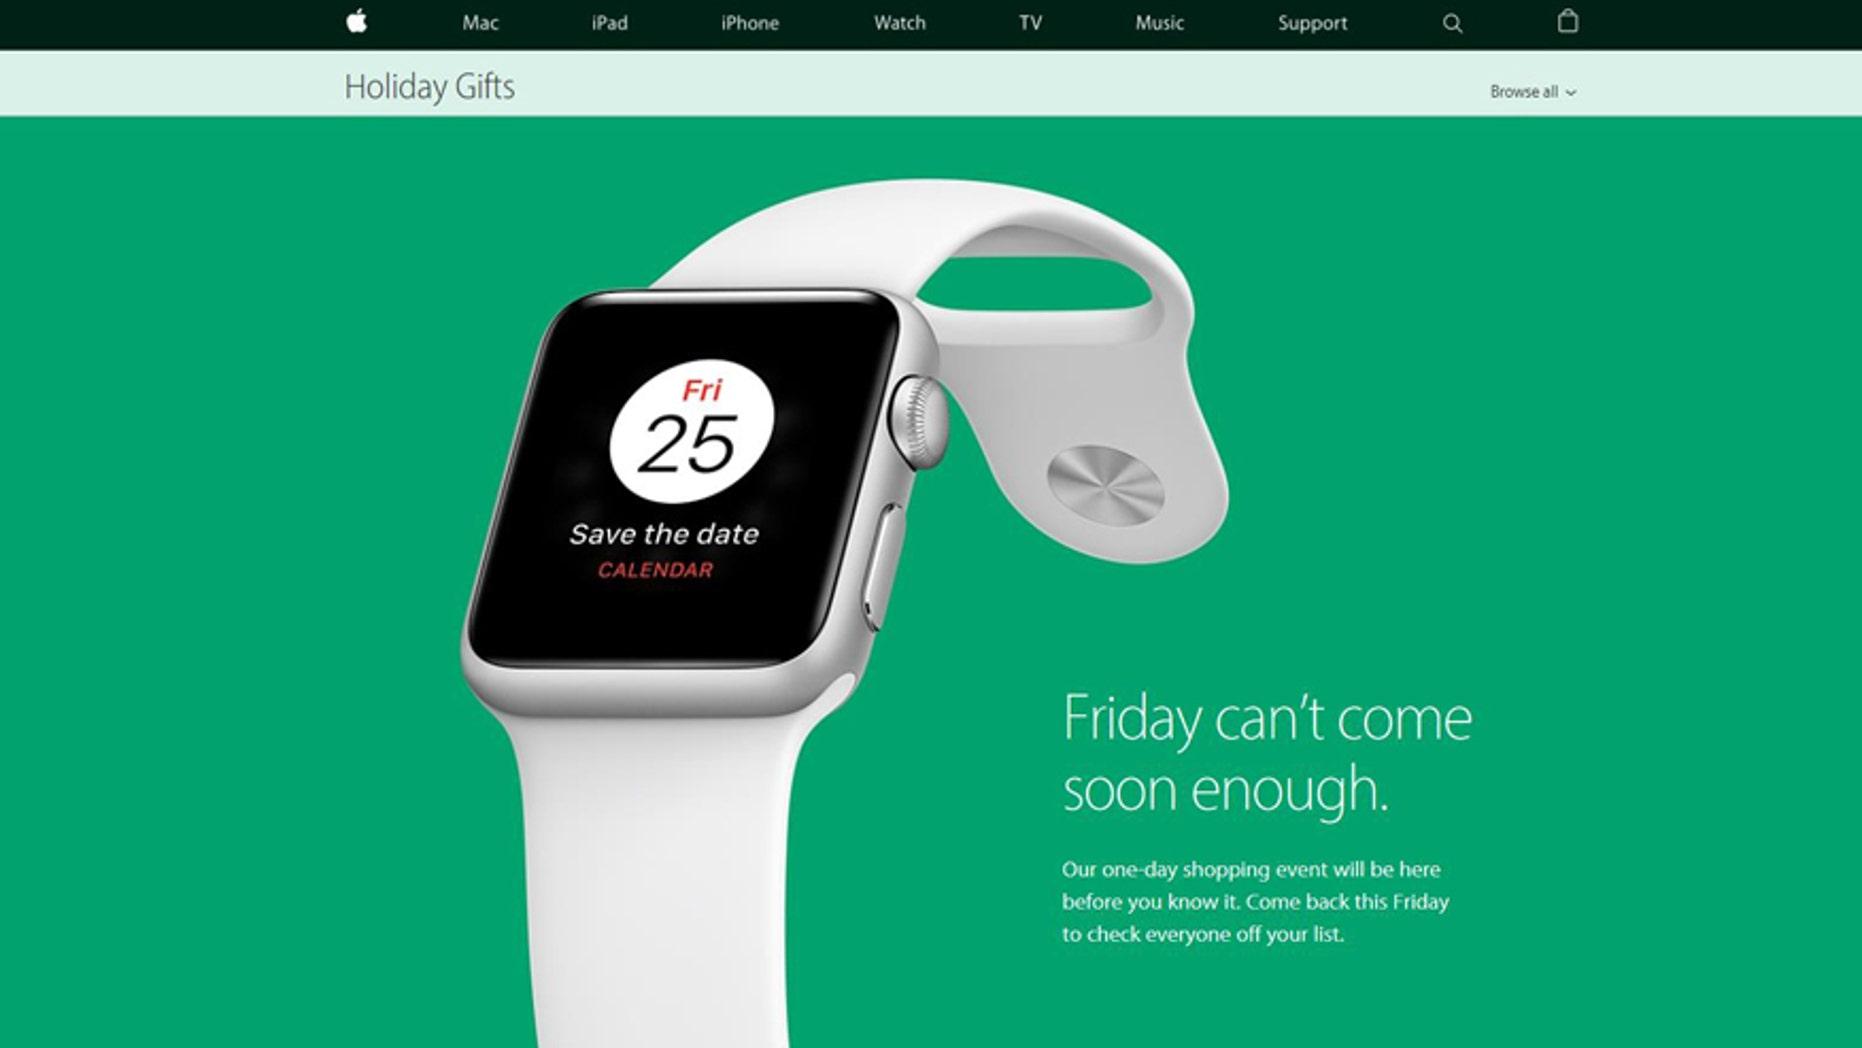 (Screenshot from www.apple.com)